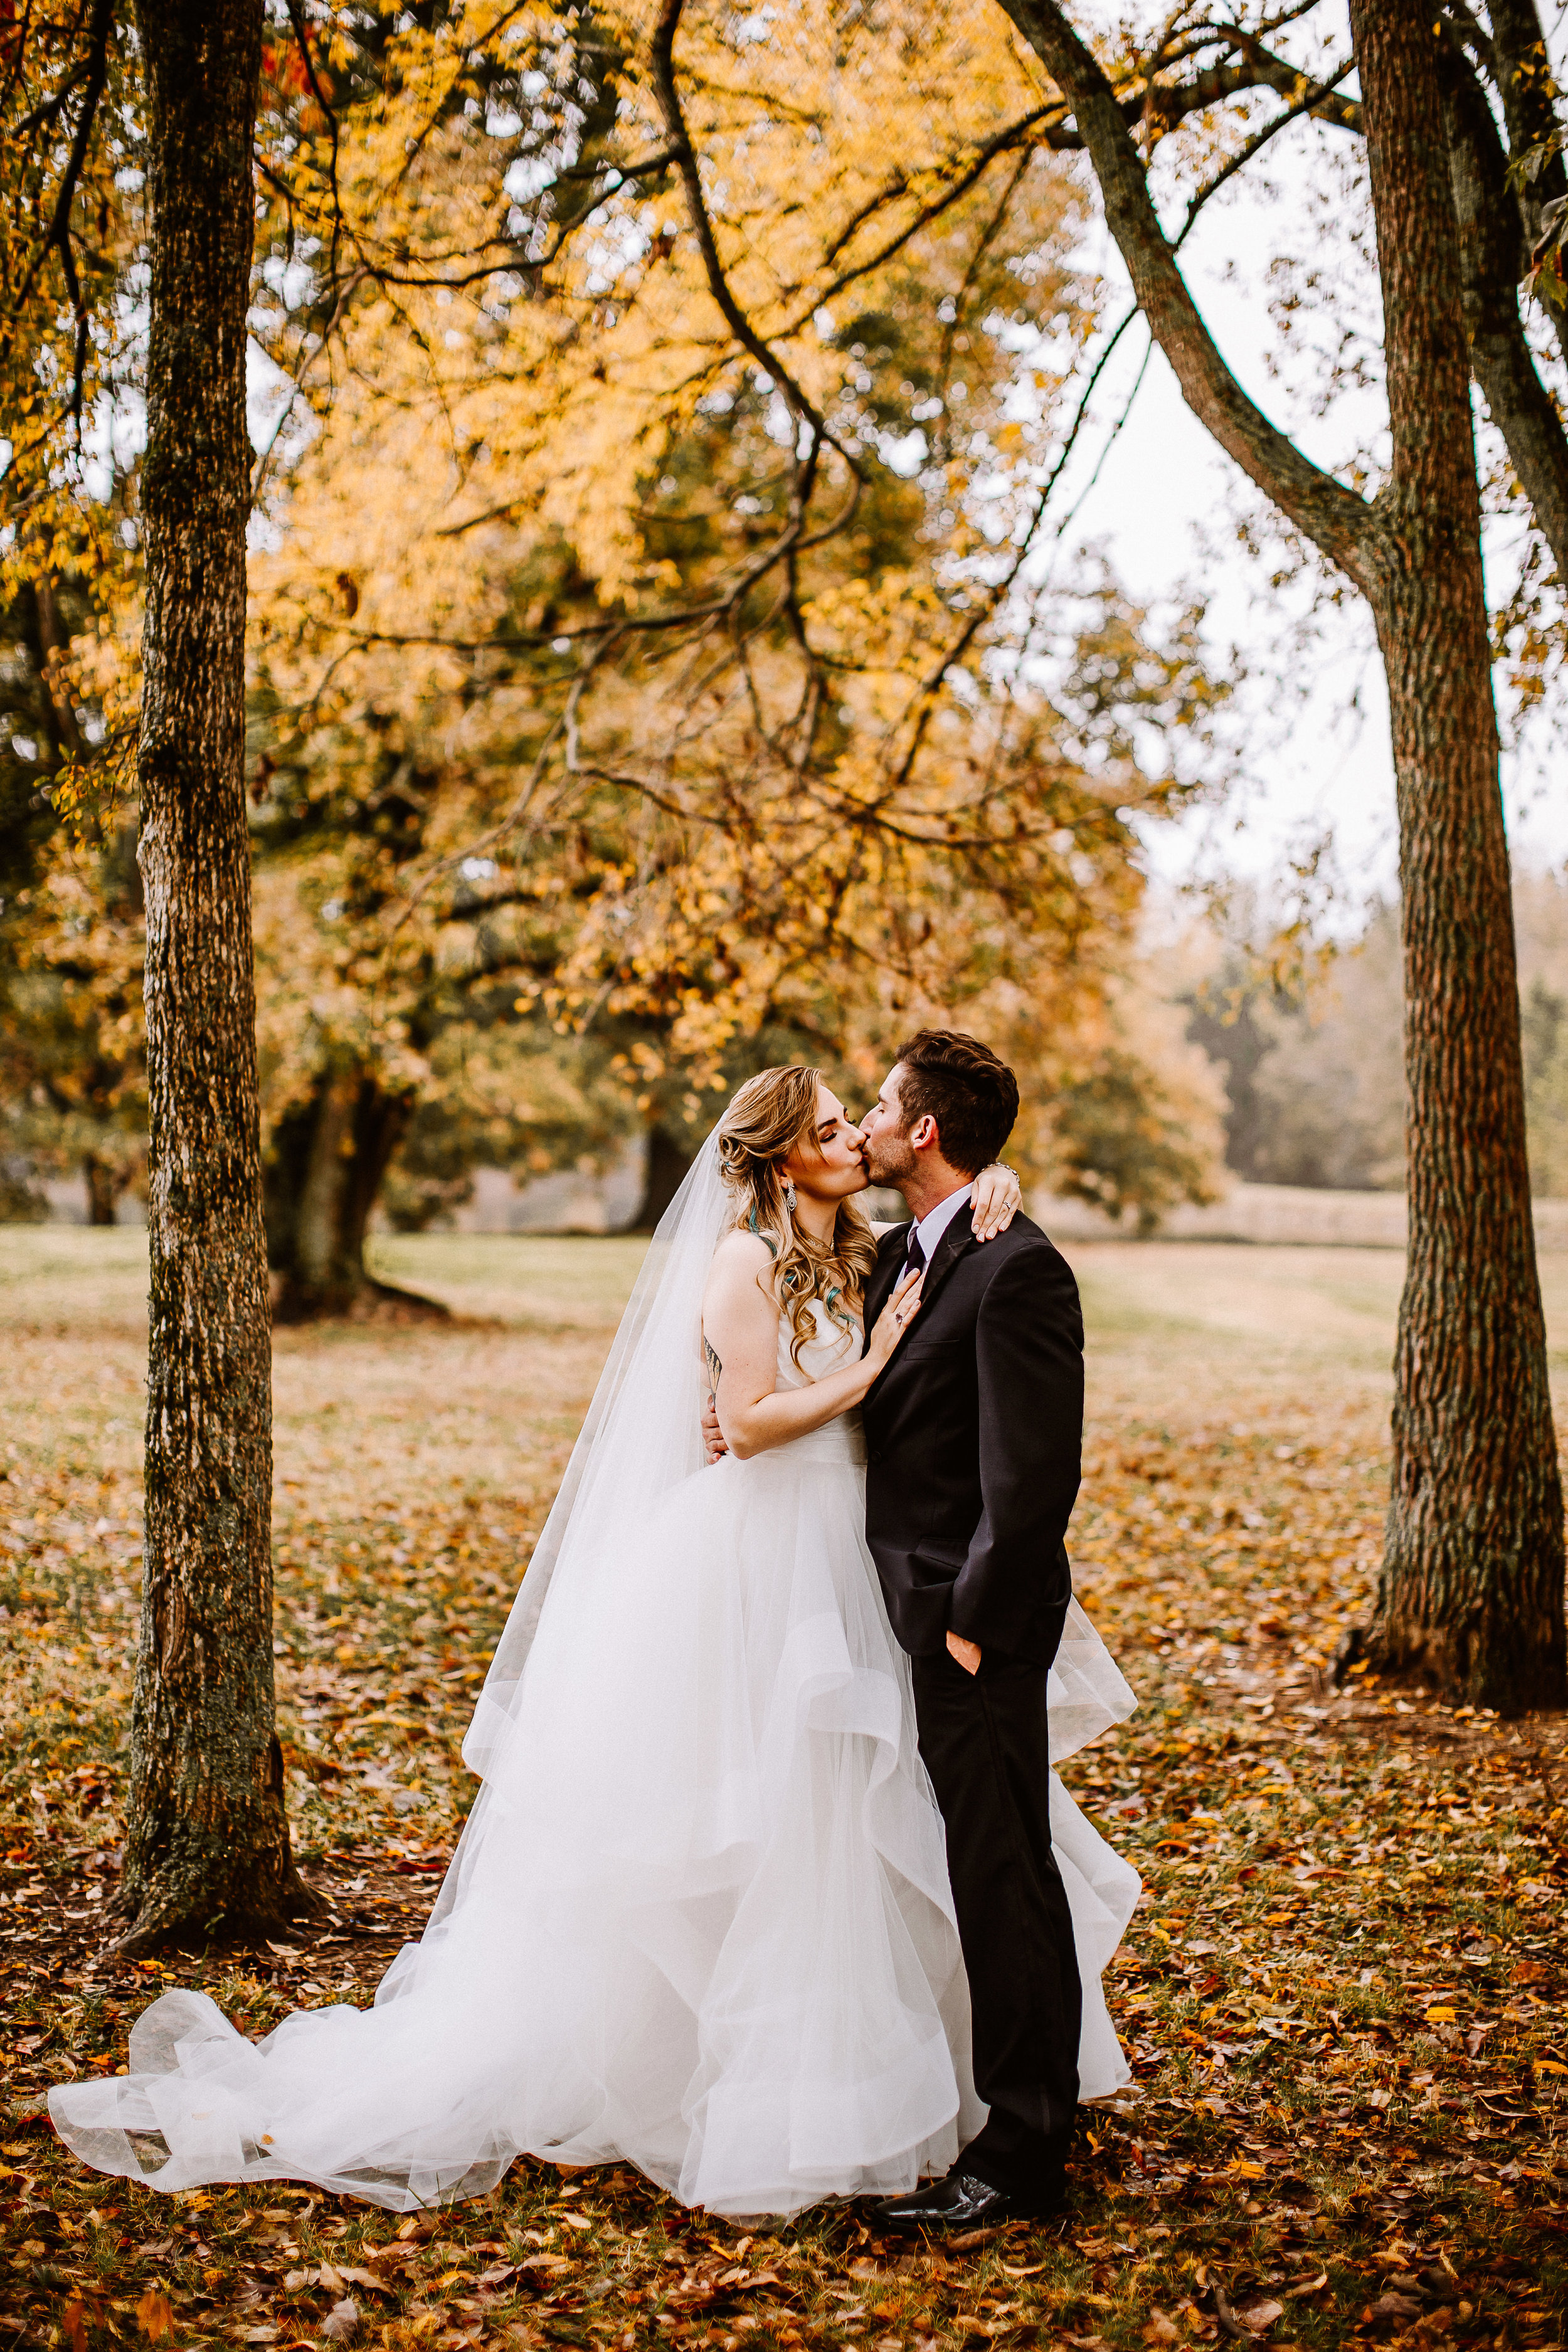 Lucchesi-Wedding_Shelby-Farms_Ashley-Benham-Photography-143.jpg